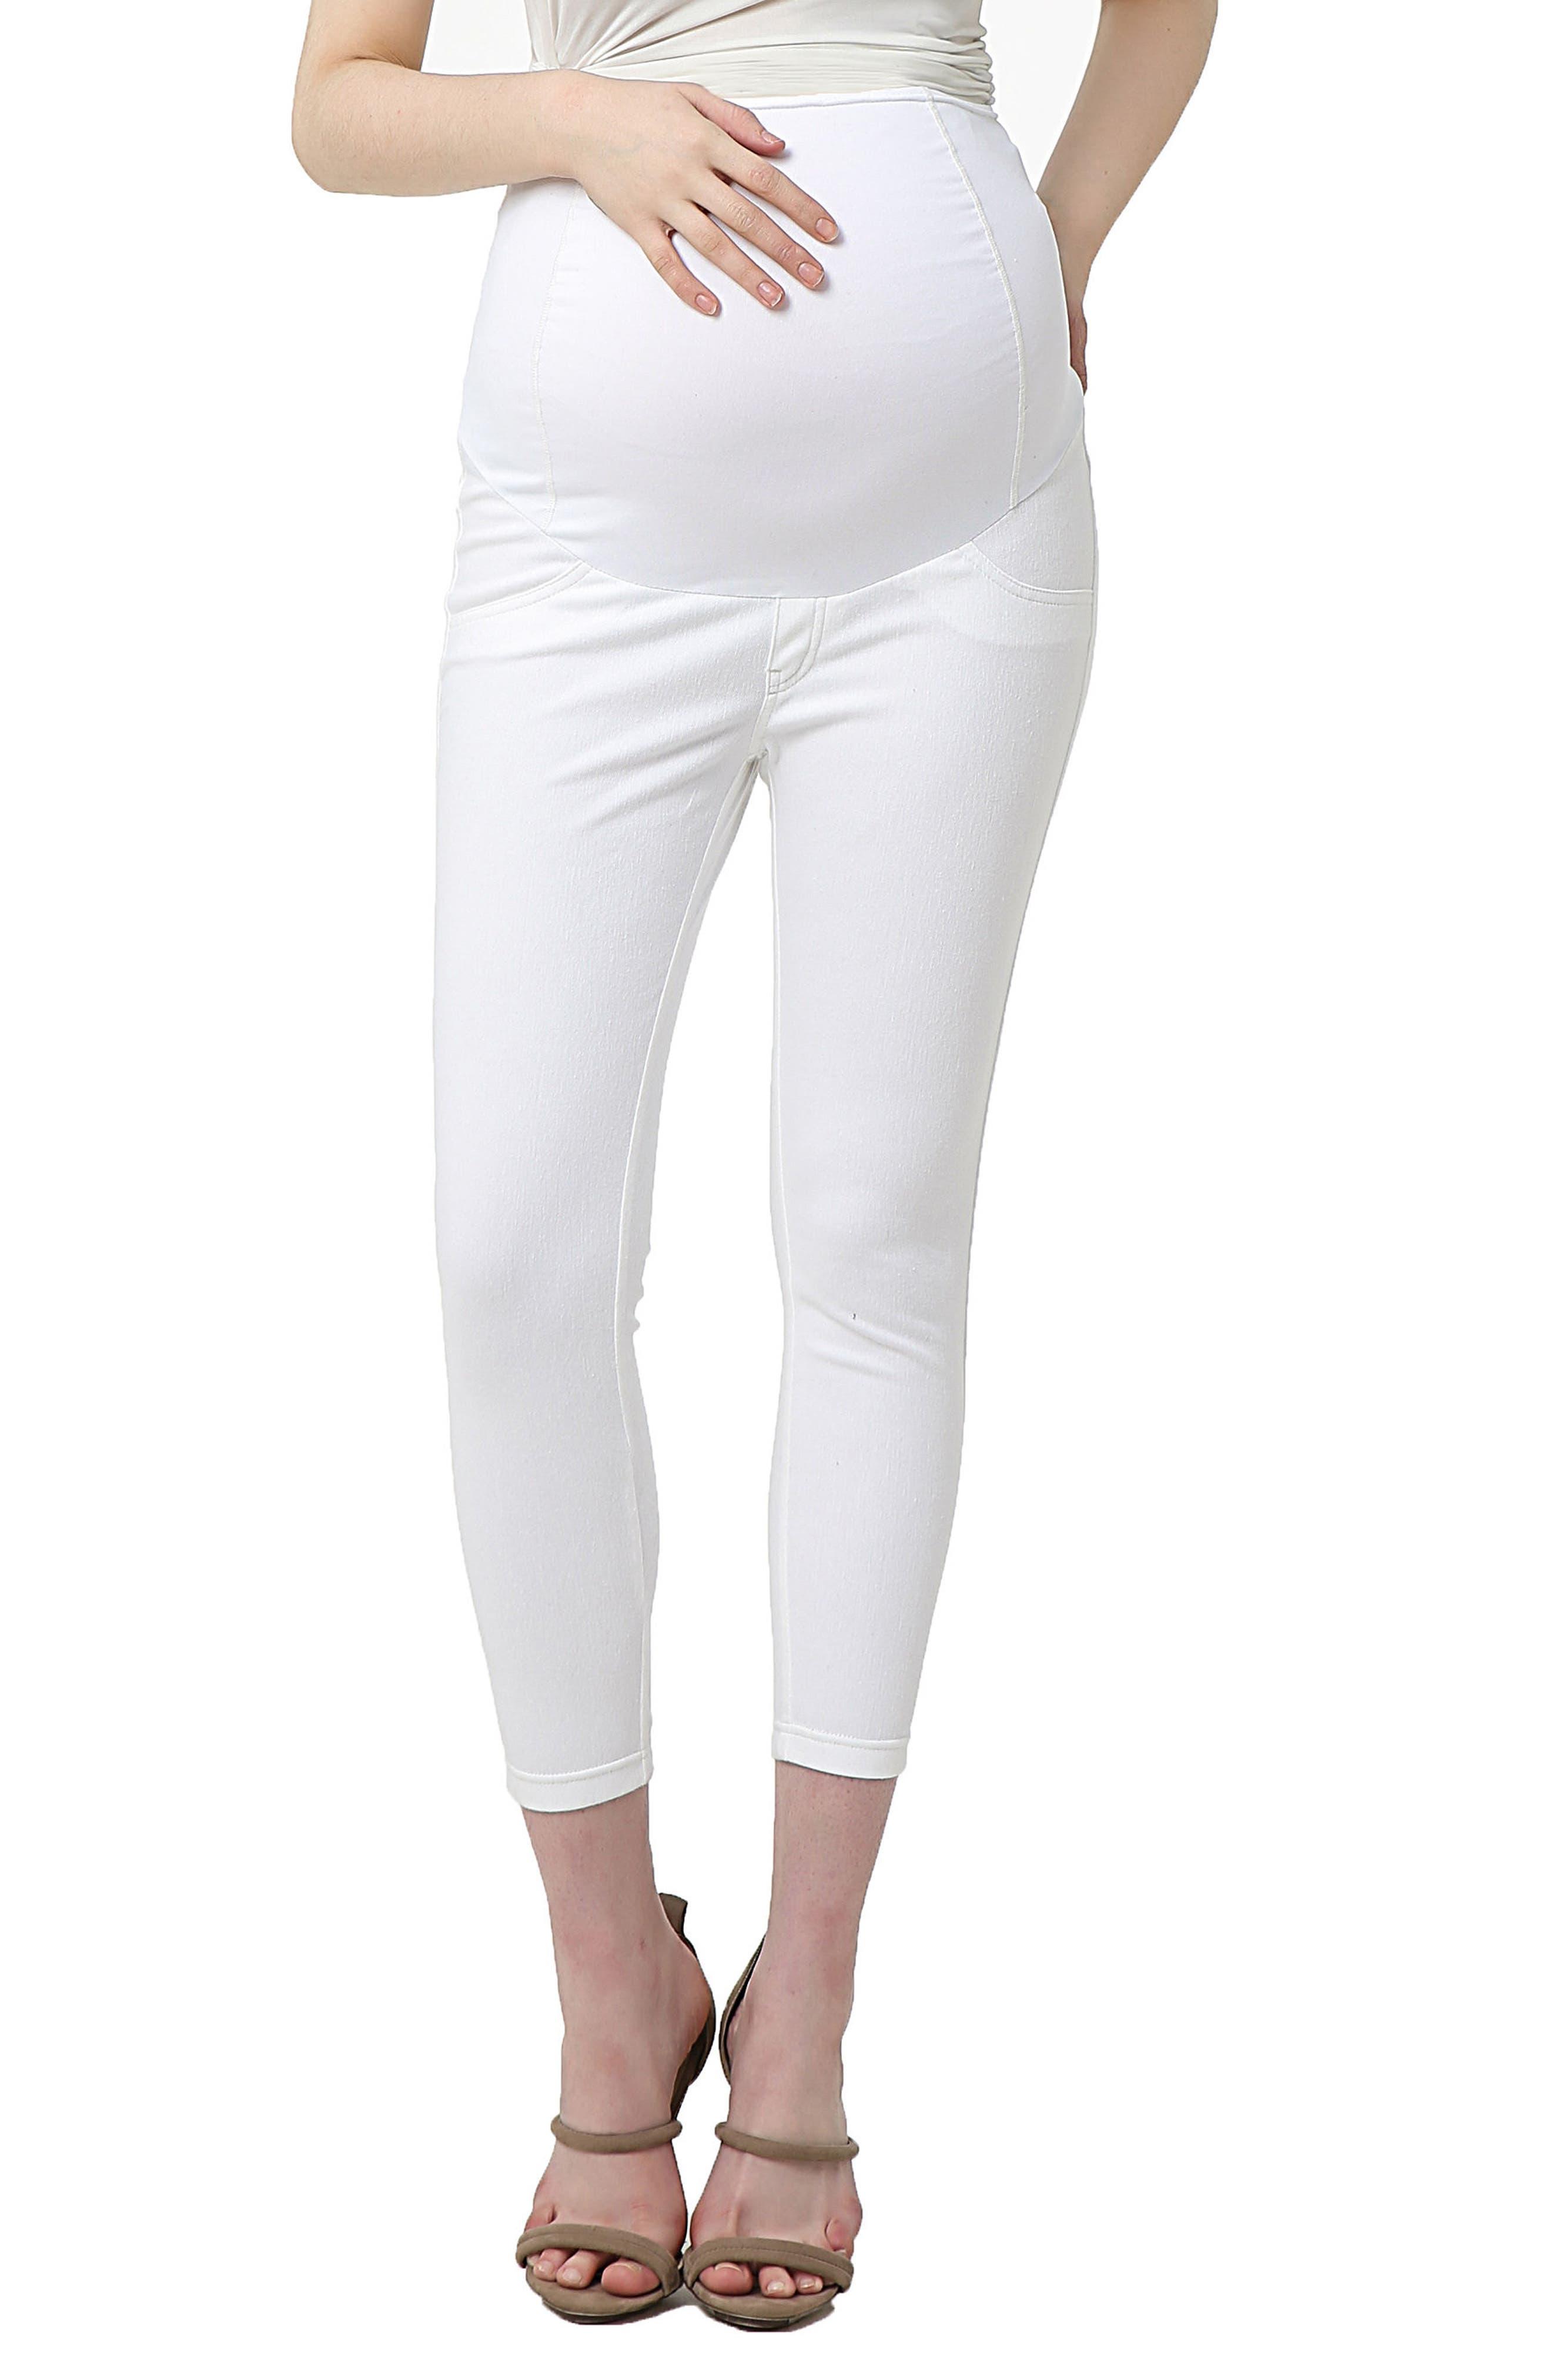 Tia Cropped Denim Maternity Leggings,                         Main,                         color, WHITE